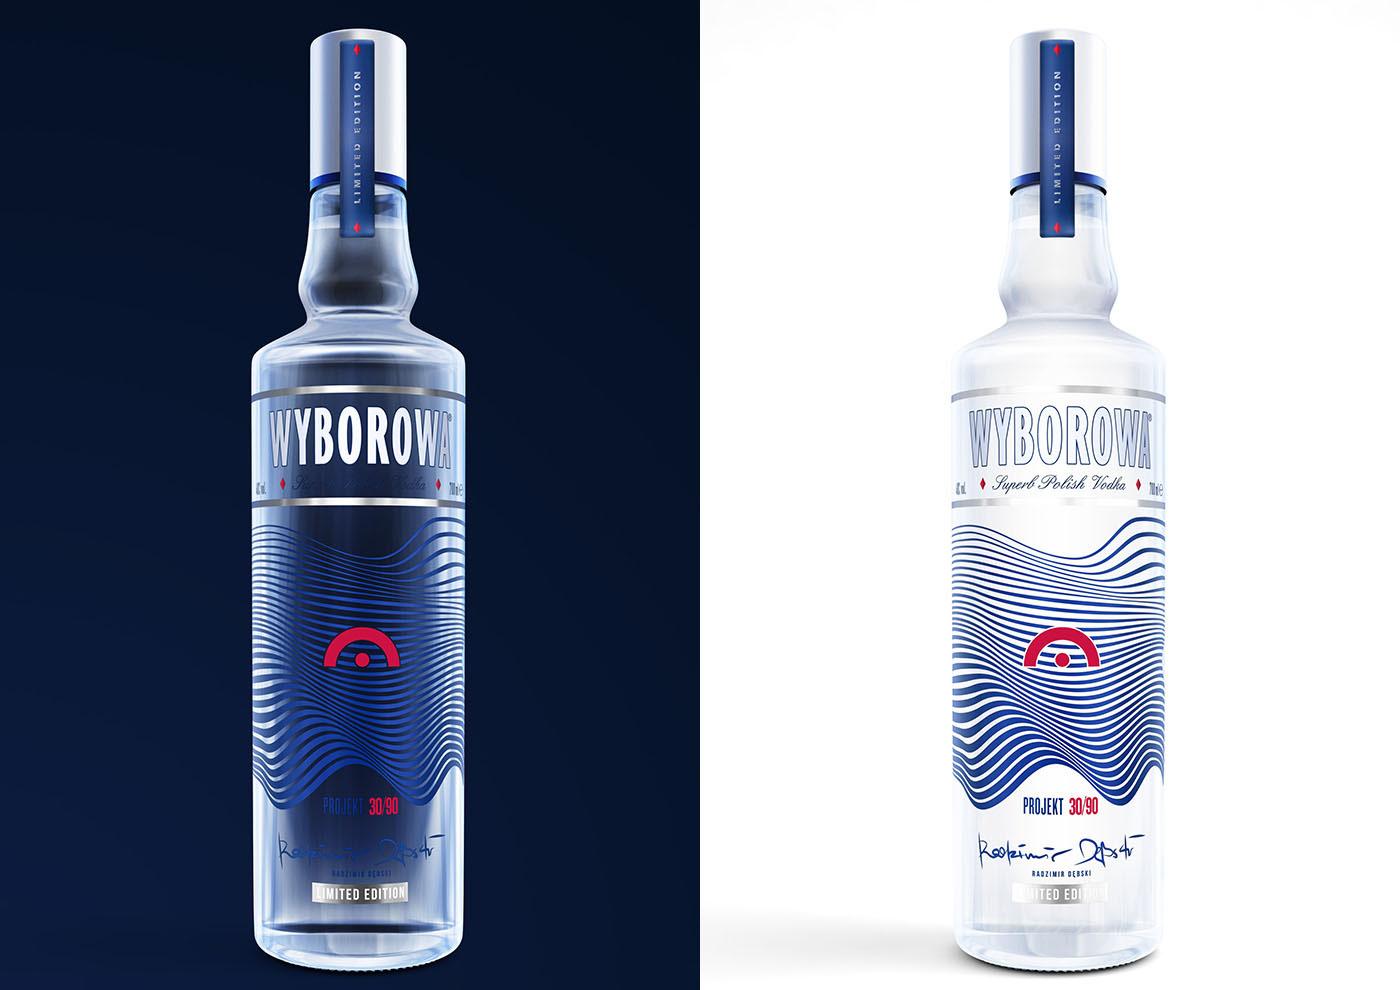 Vodka wyborowa bottle 3d bottle Vodka 3D 3d glass